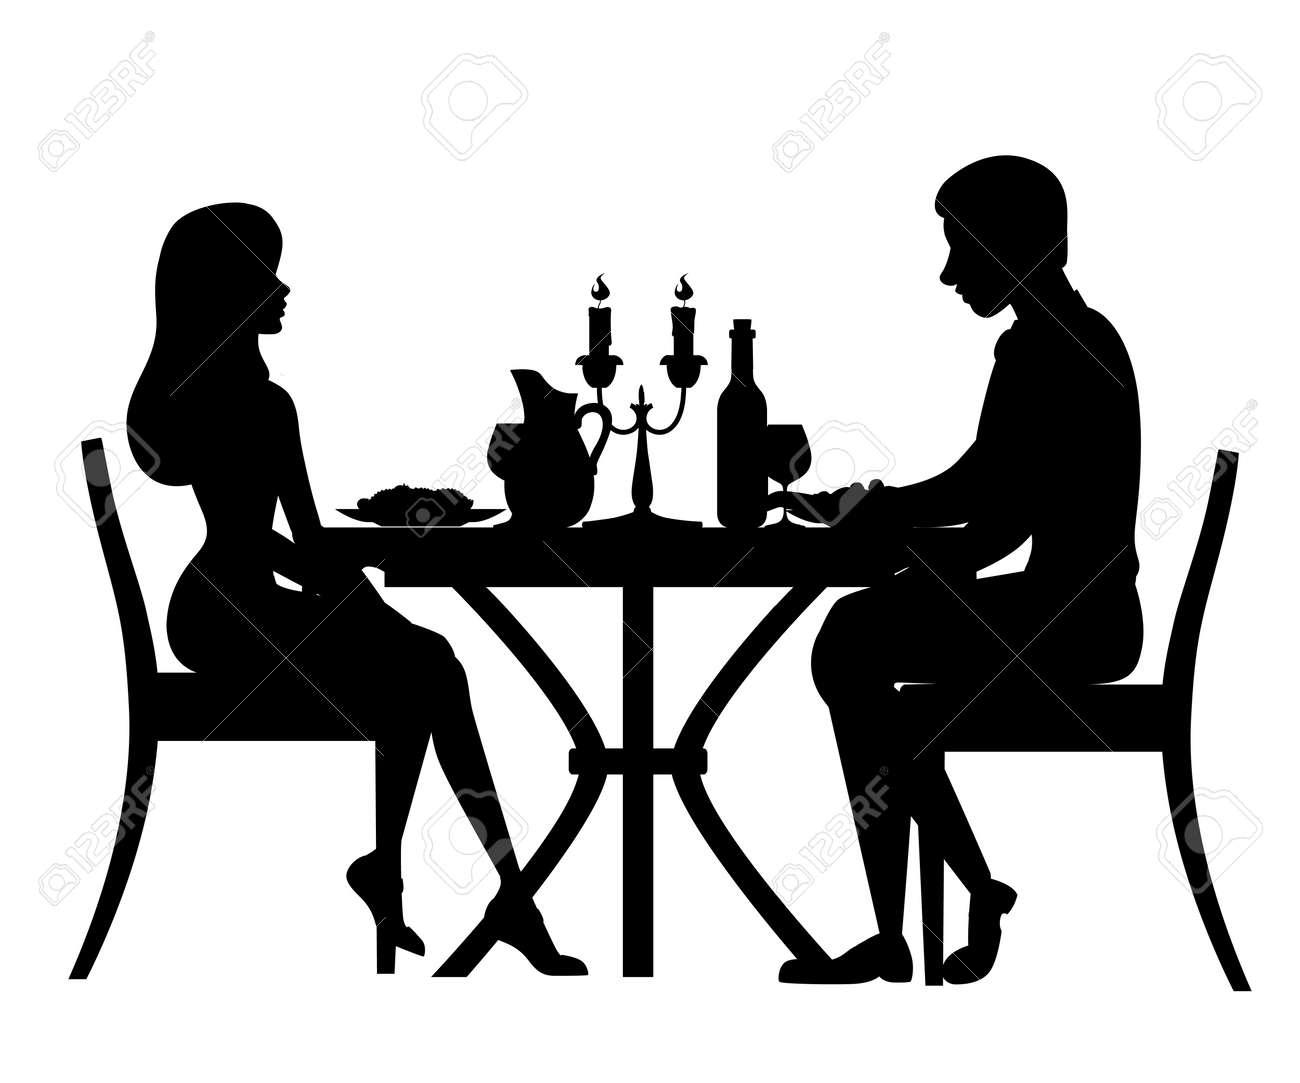 Siti dating Ιταλία δωρεάν